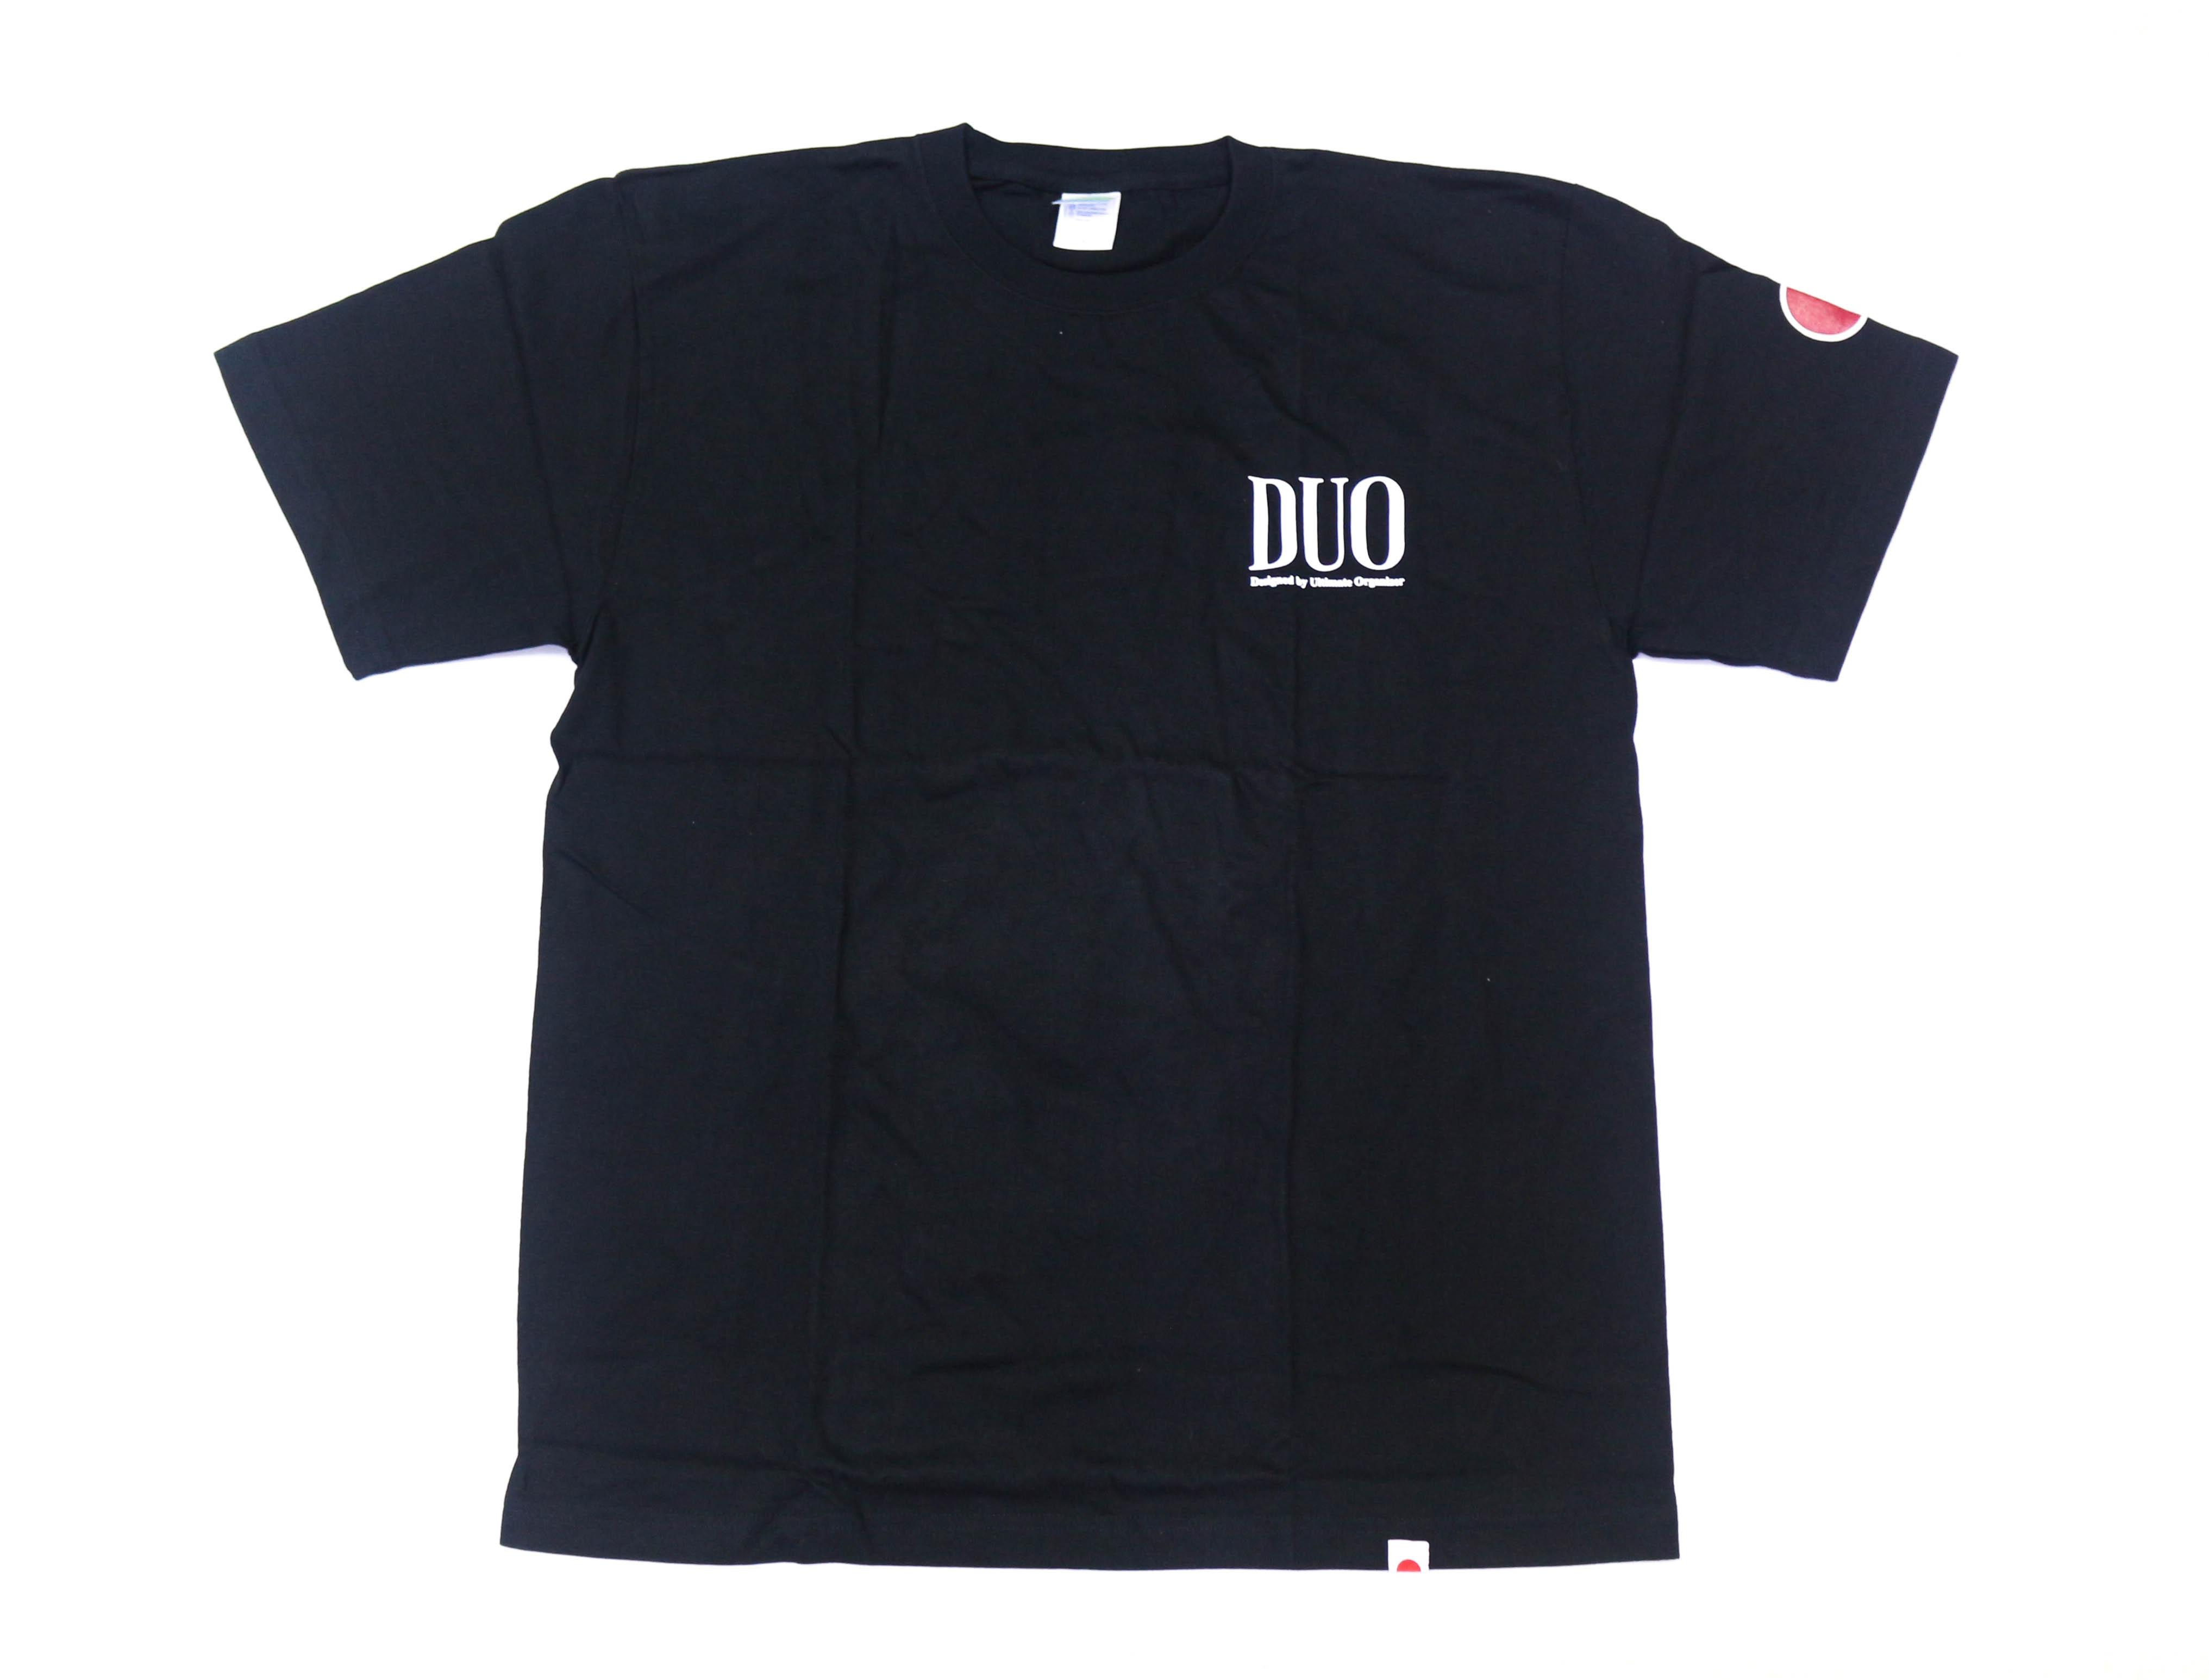 Duo T-Shirt Tioo Original Black Size XL (2247)